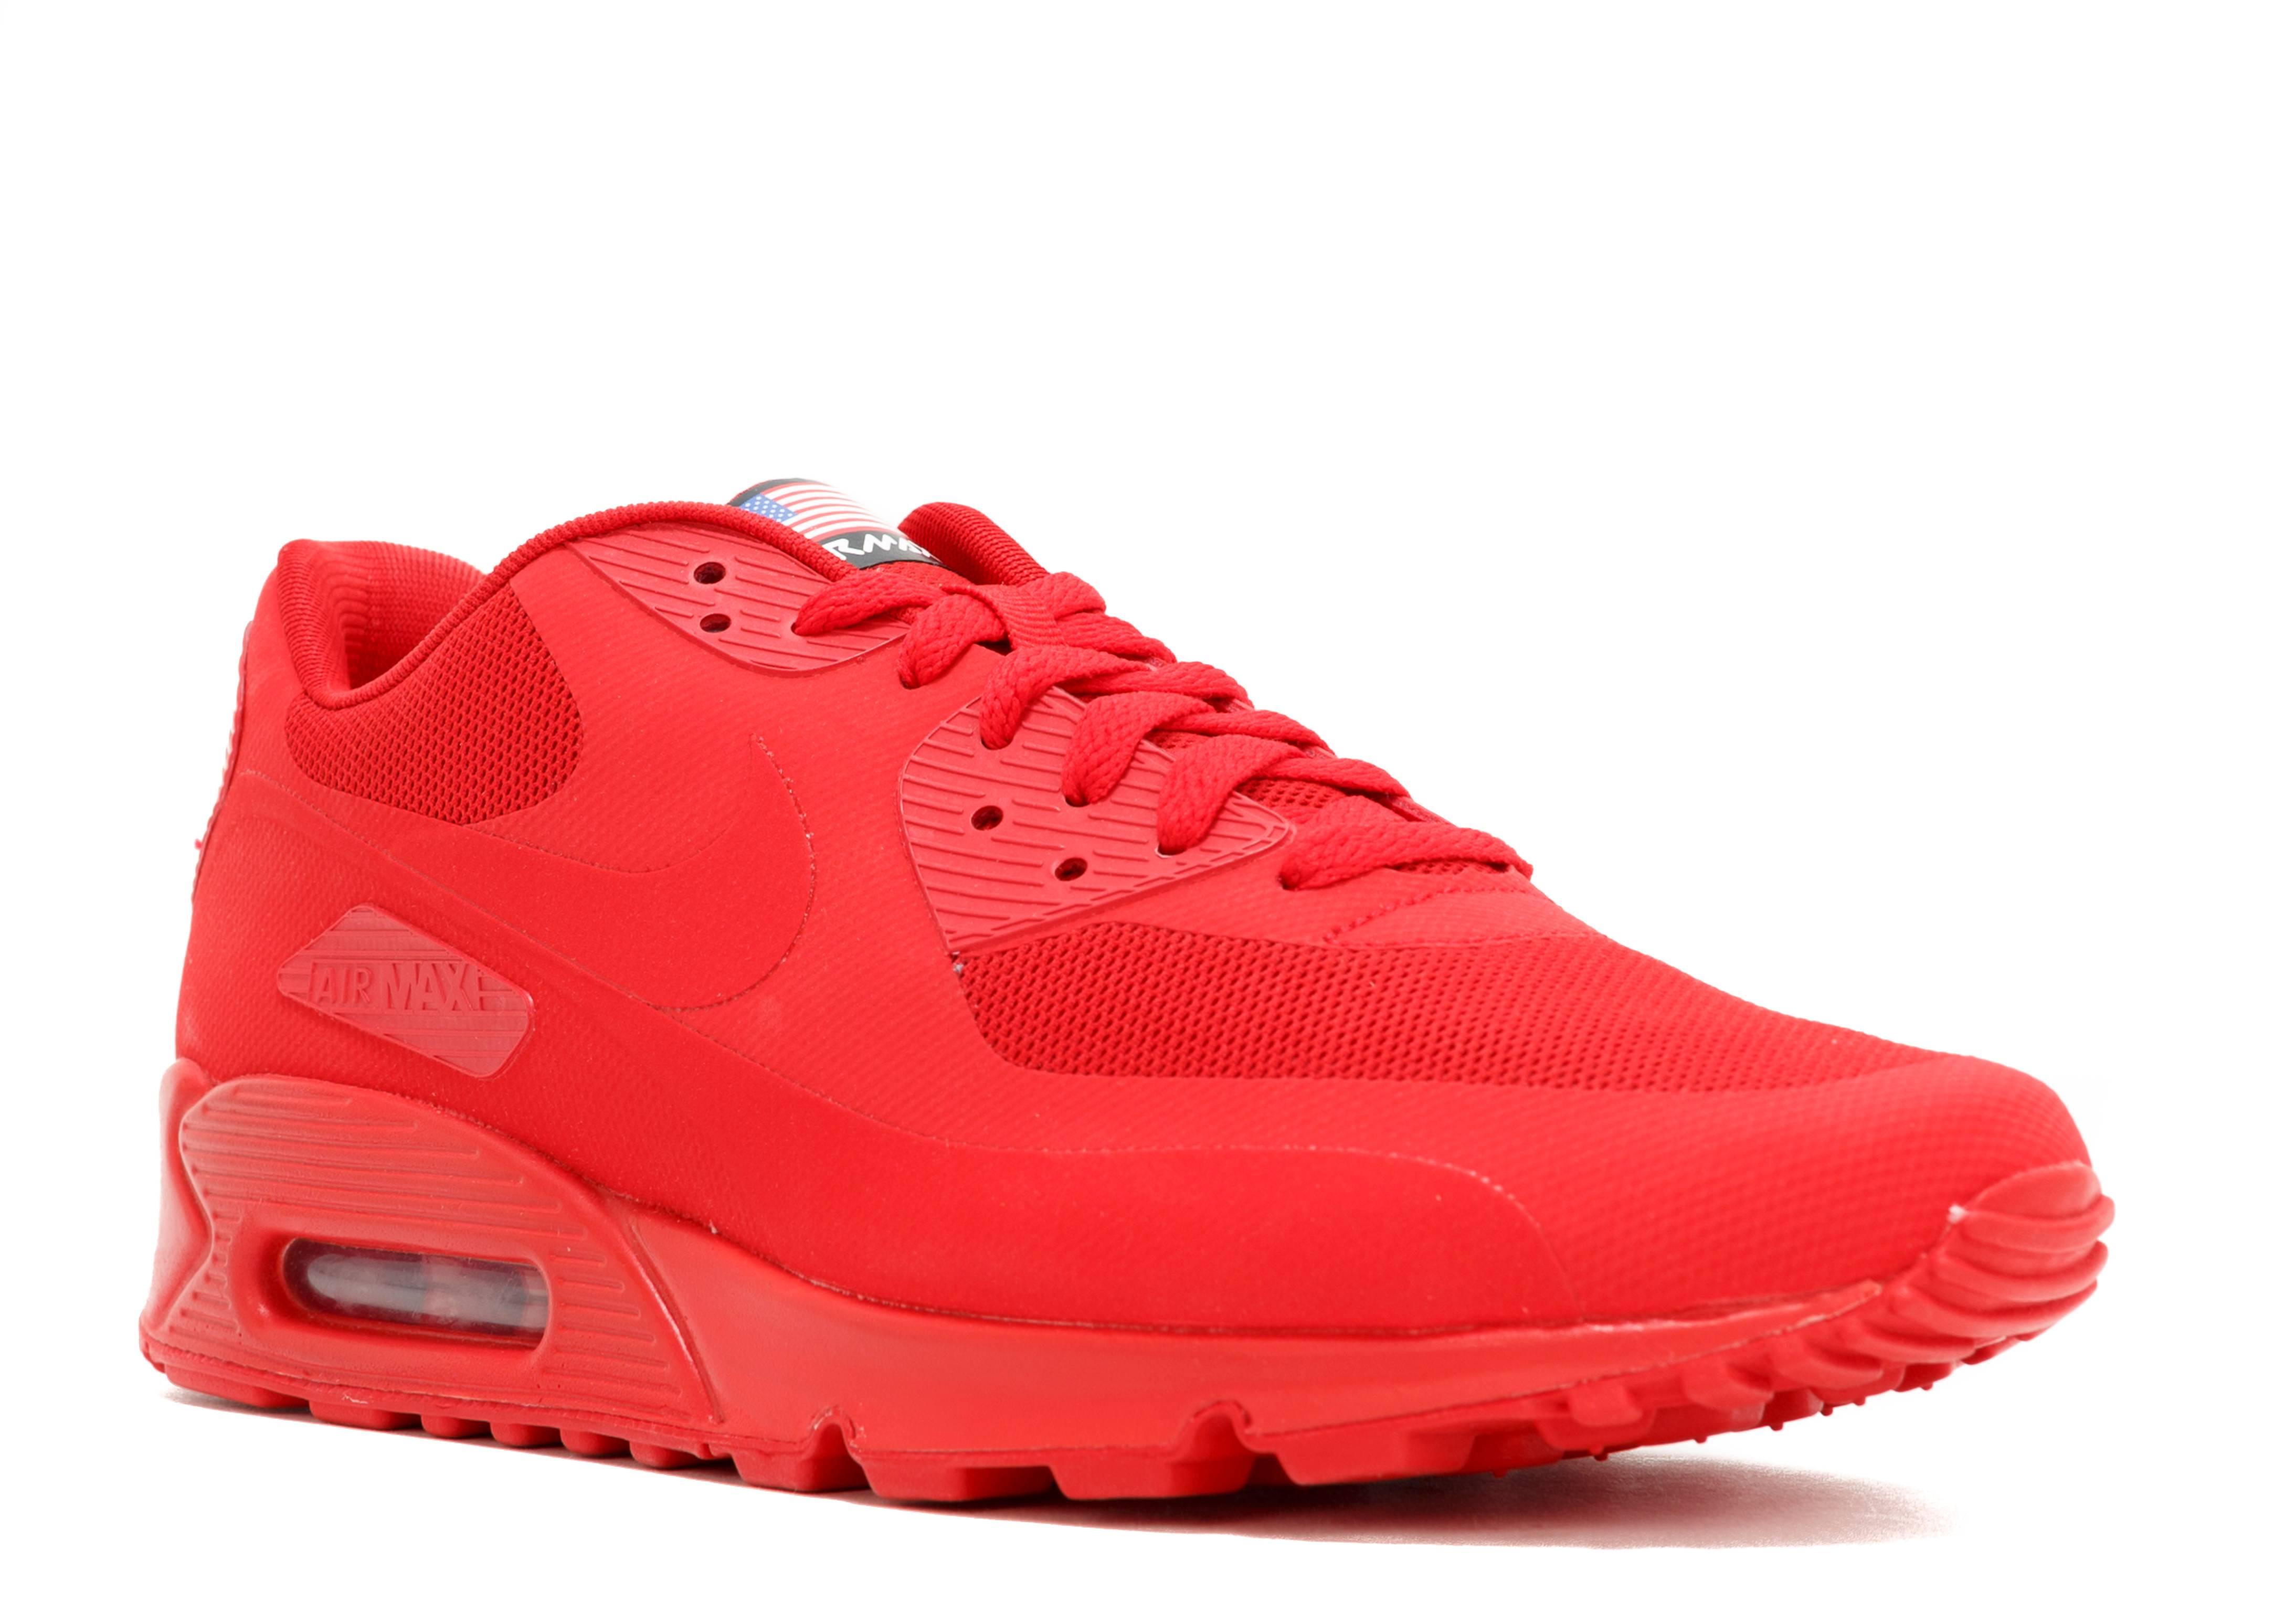 pesadilla preocupación Vaticinador  Air Max 90 Hyperfuse QS 'USA' - Nike - 613841 660 - sport red/sport red |  Flight Club